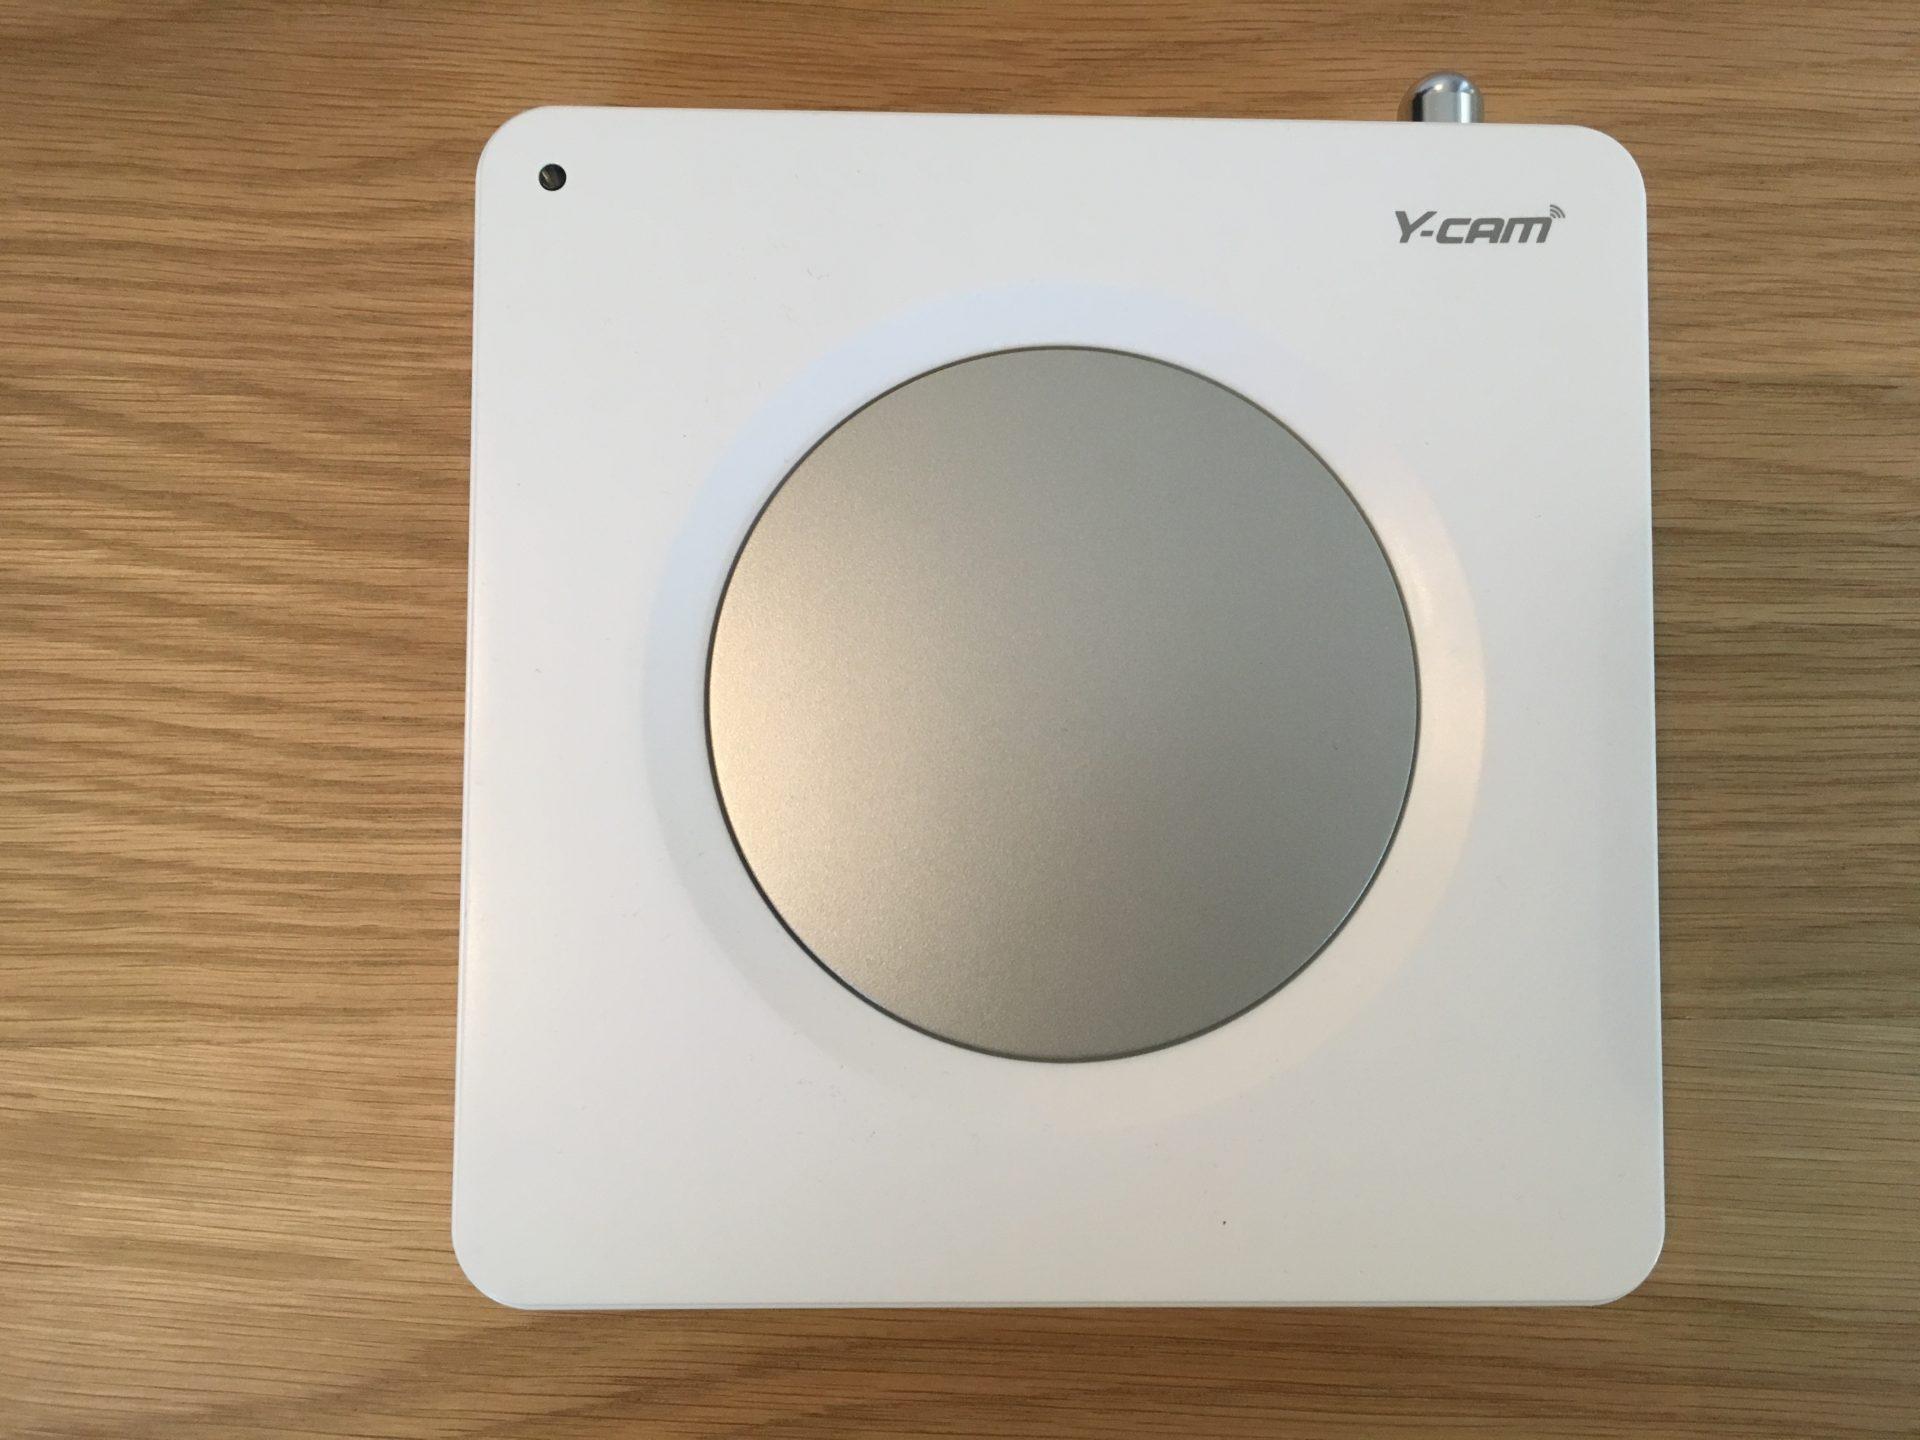 Y-cam Protect Hub